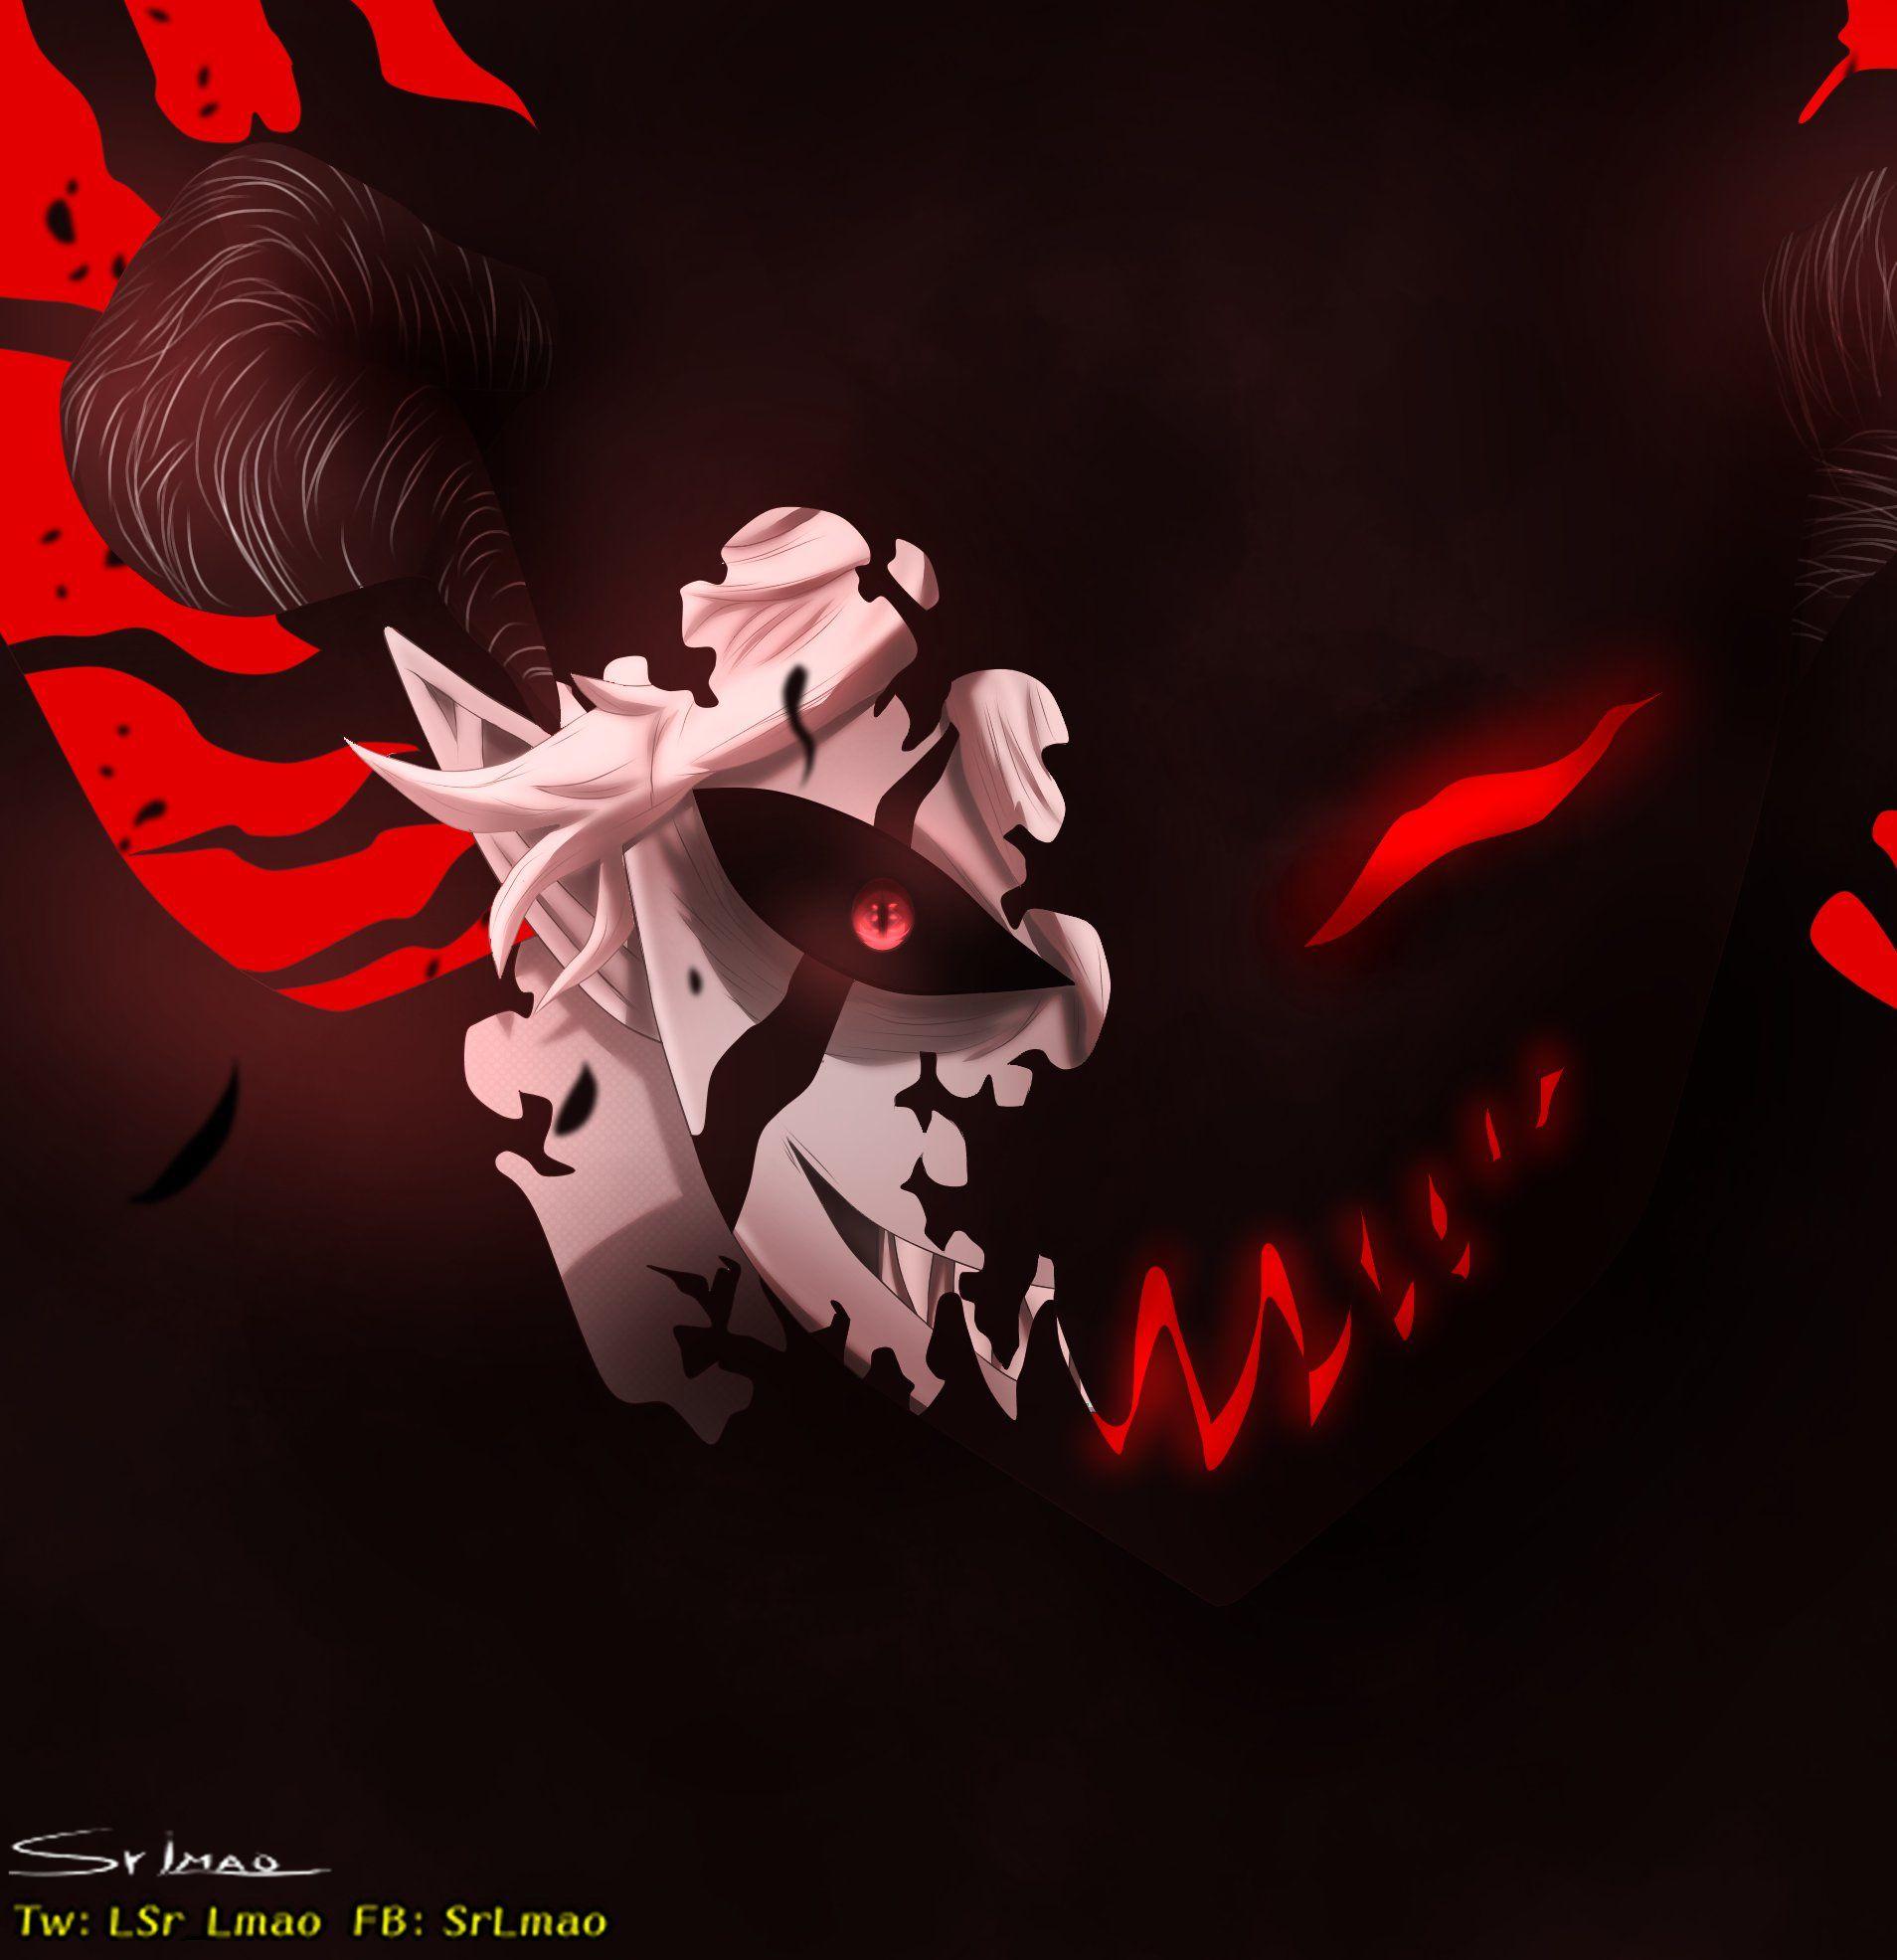 Pin By Kurikata On Black Clover Black Clover Anime Dark Anime Dark Fantasy Art